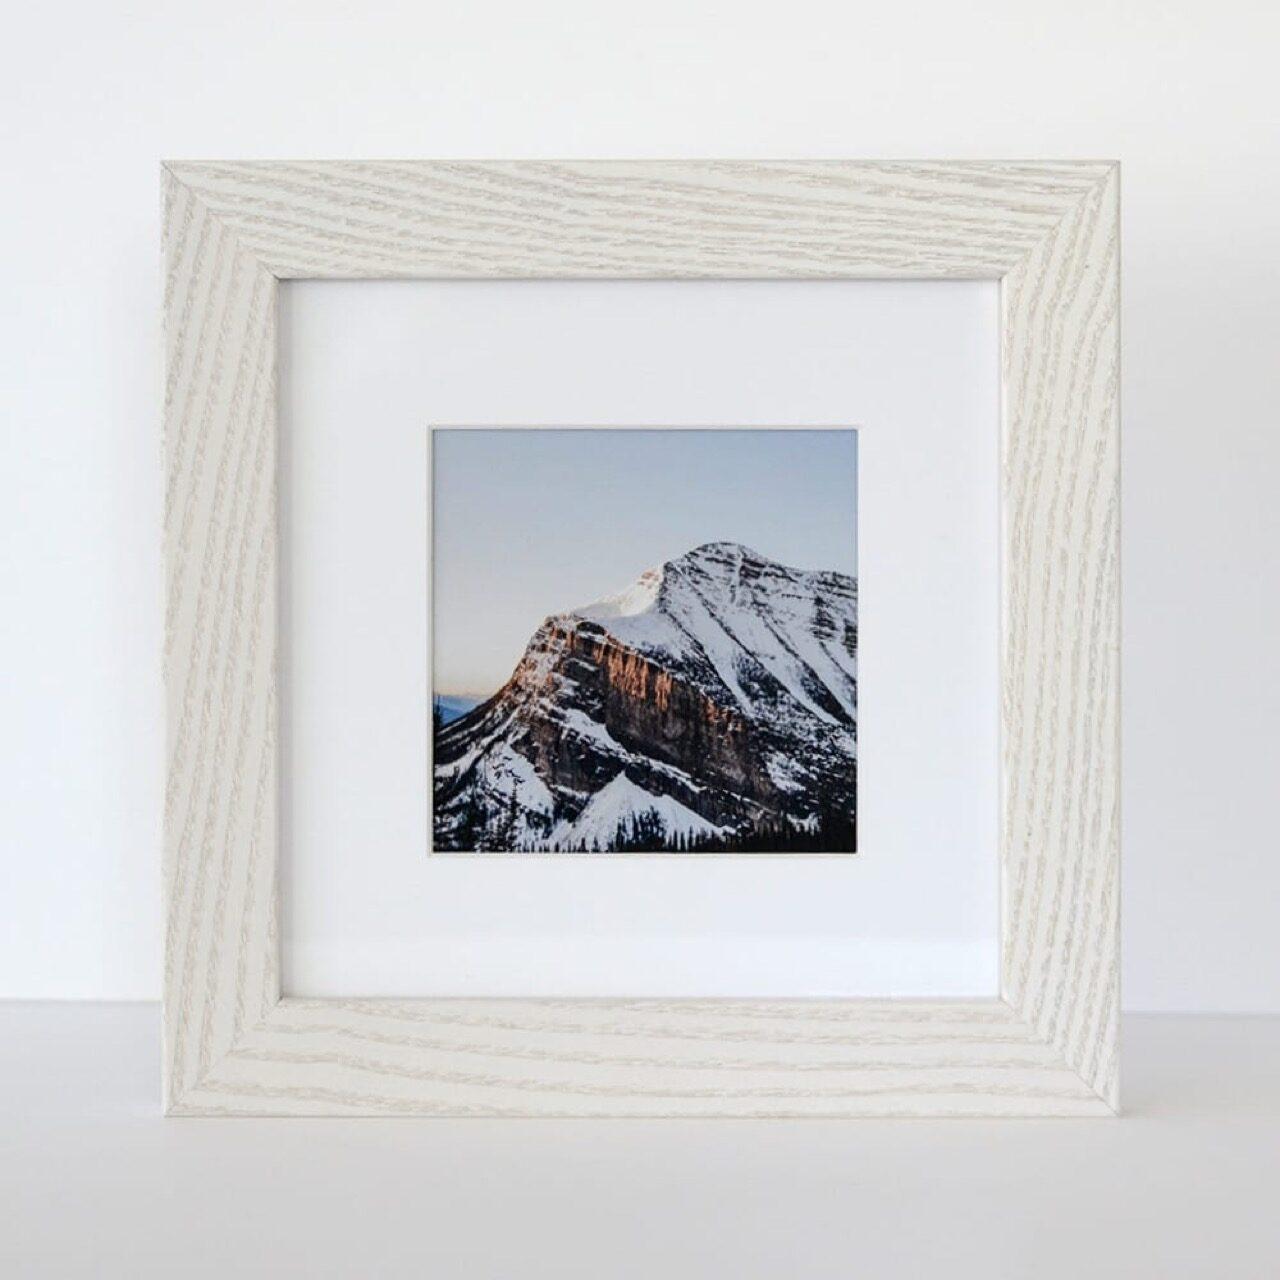 Dayton frame in Whitewash